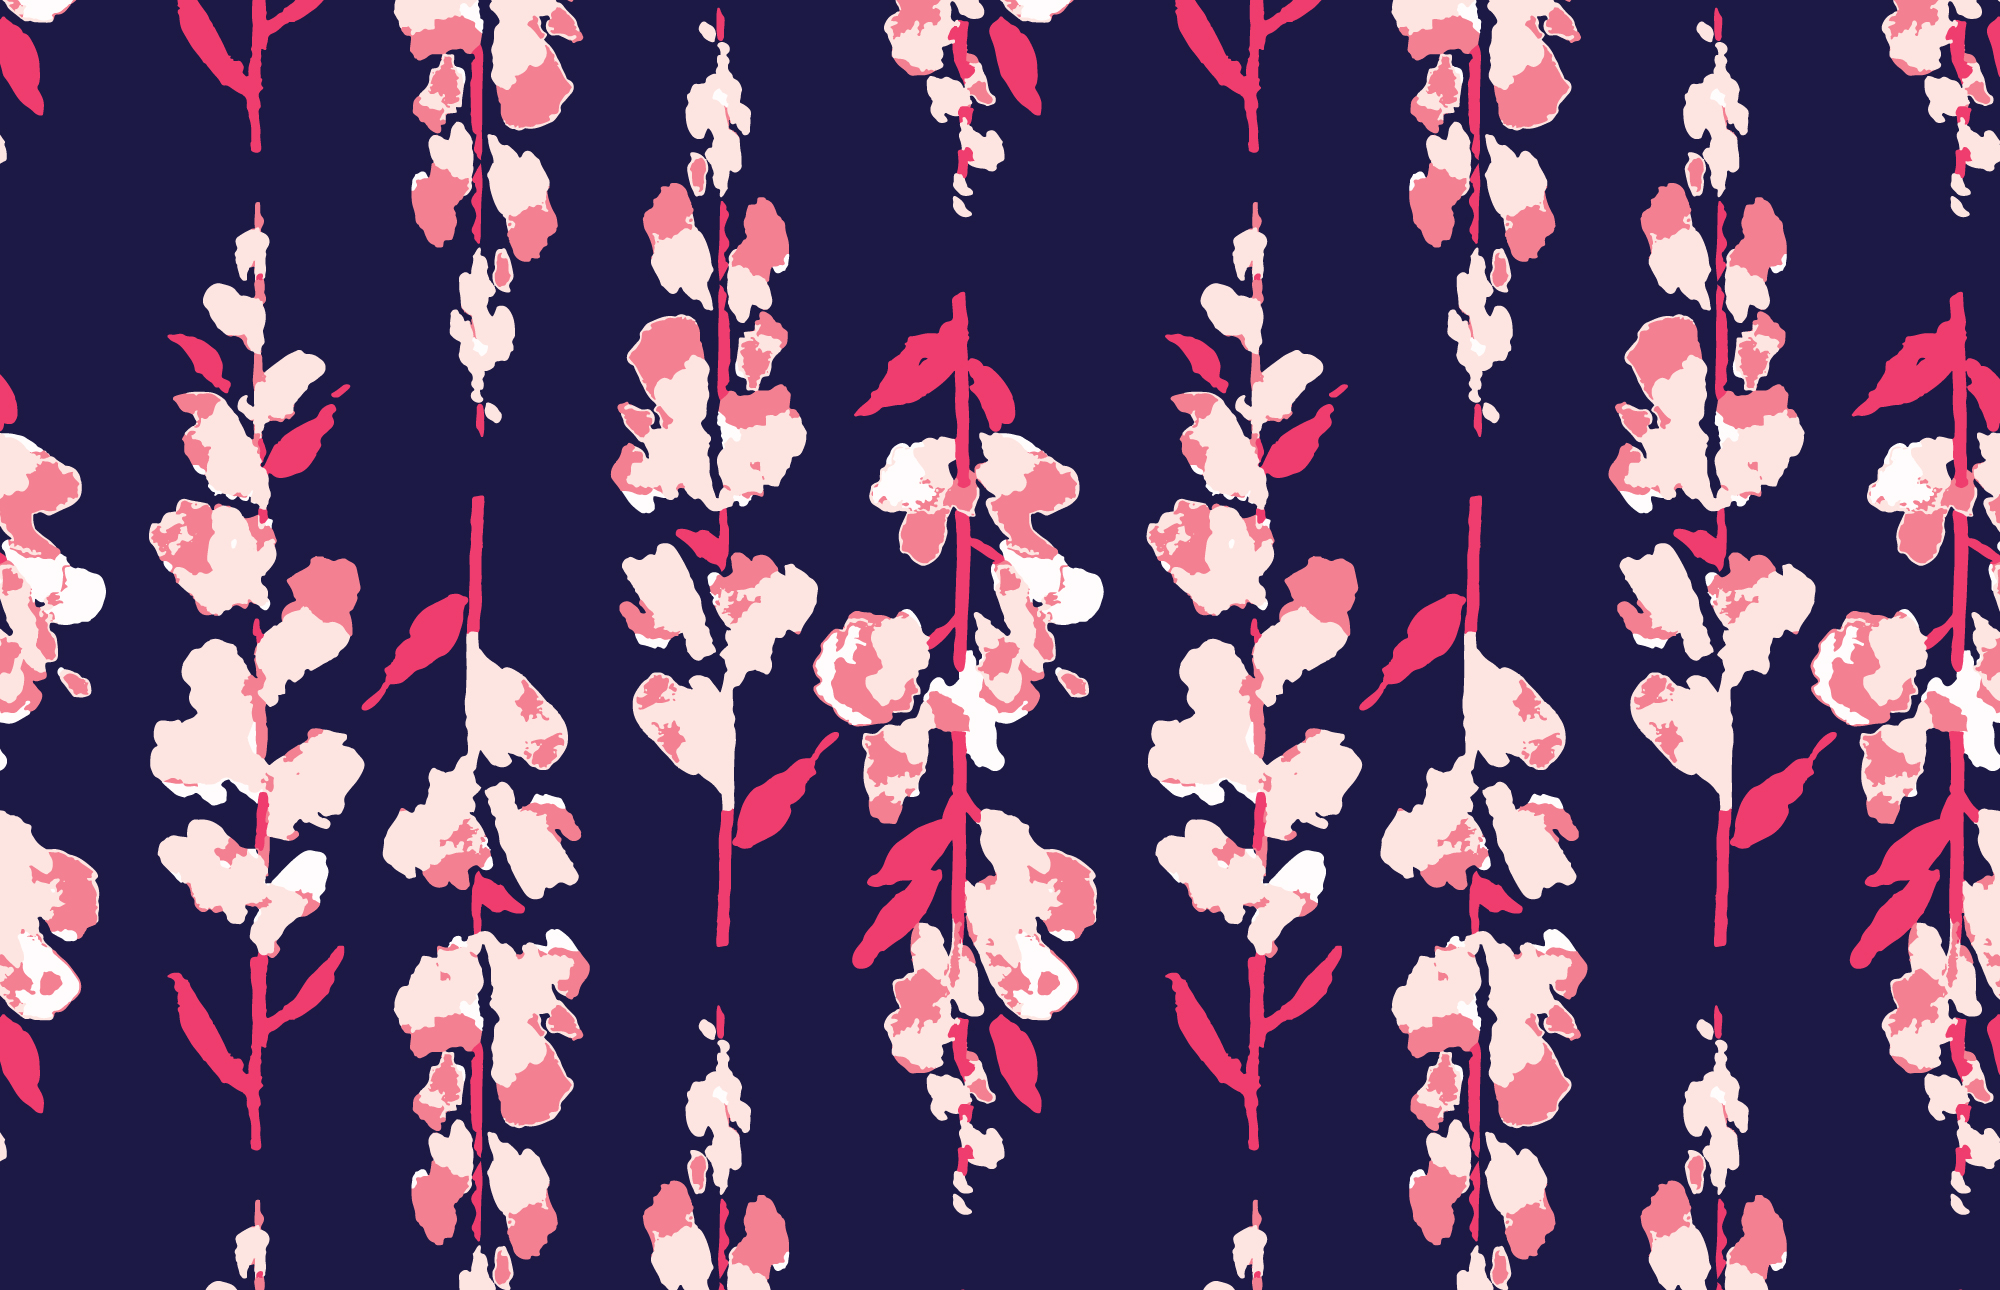 gallery-pattern-2.jpg